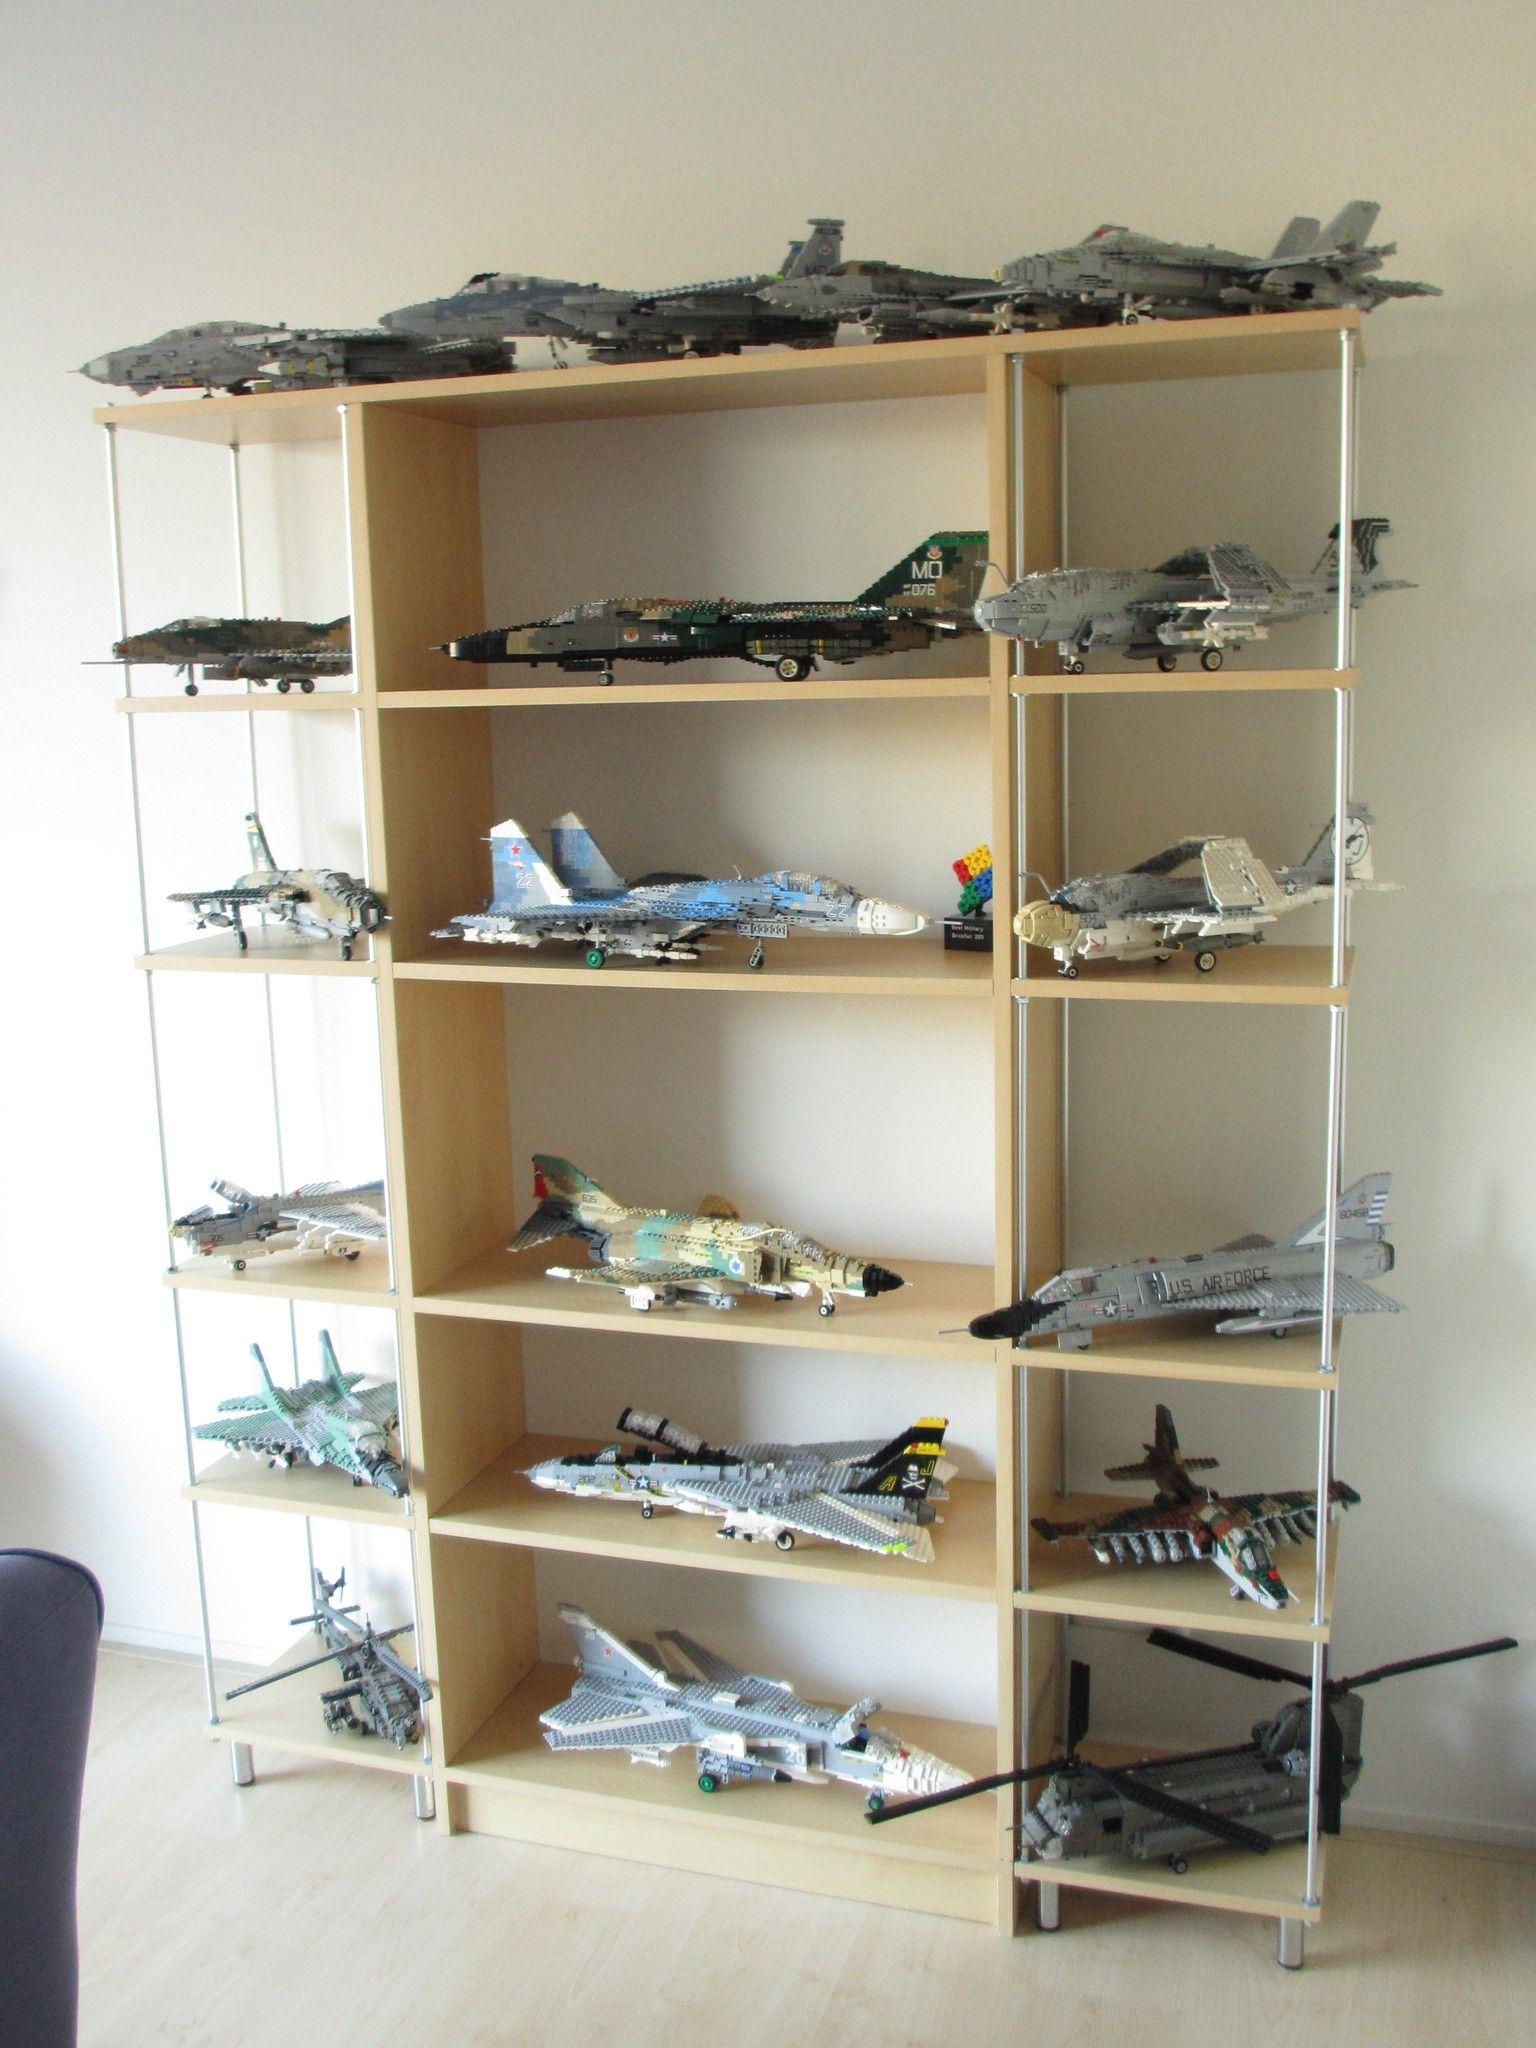 Aircraft Shelves Feb 2016 Model Airplanes Modelo A